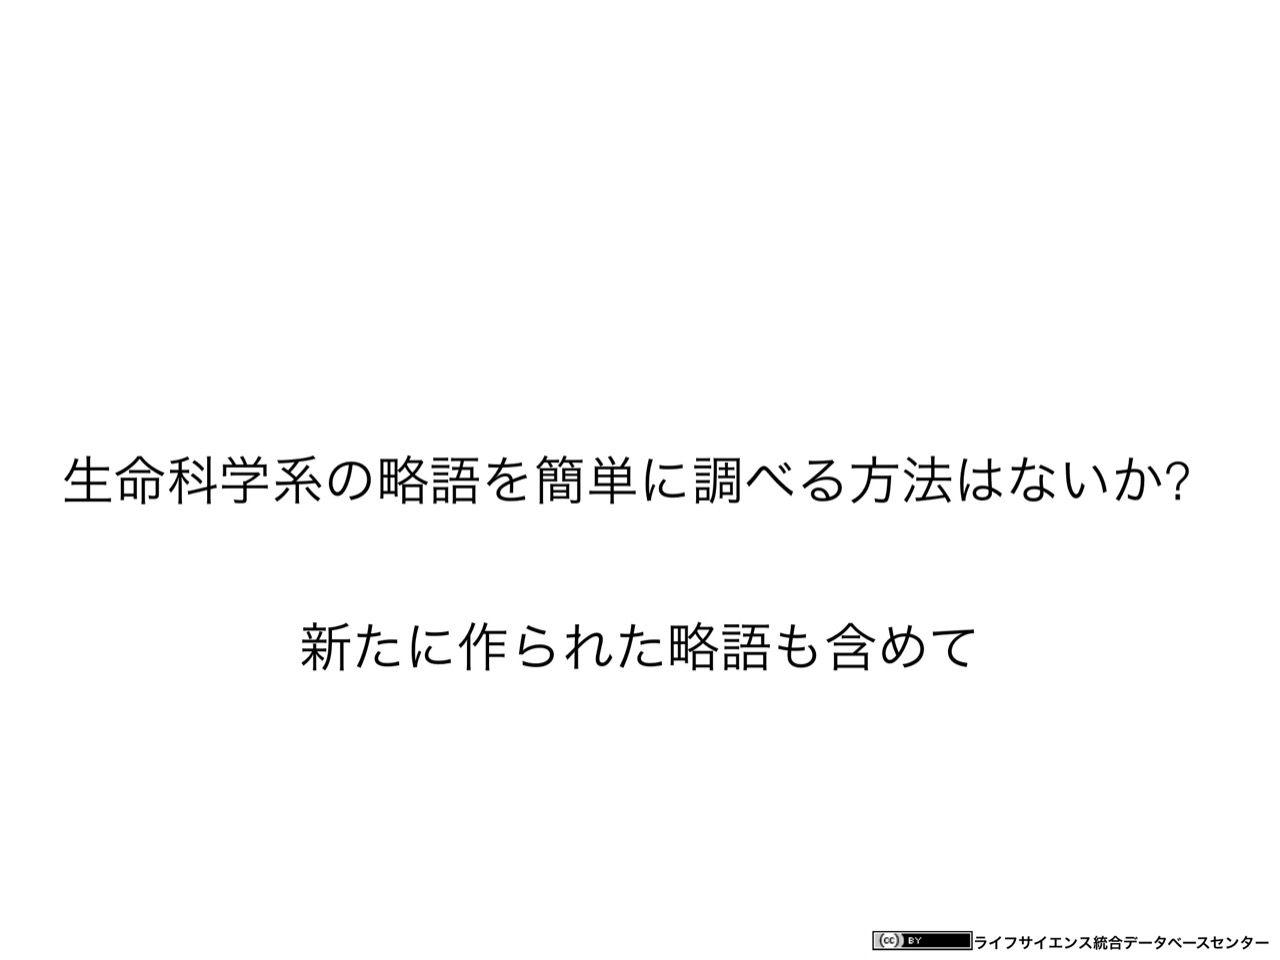 images/AJACS60_yamamoto_037.jpg